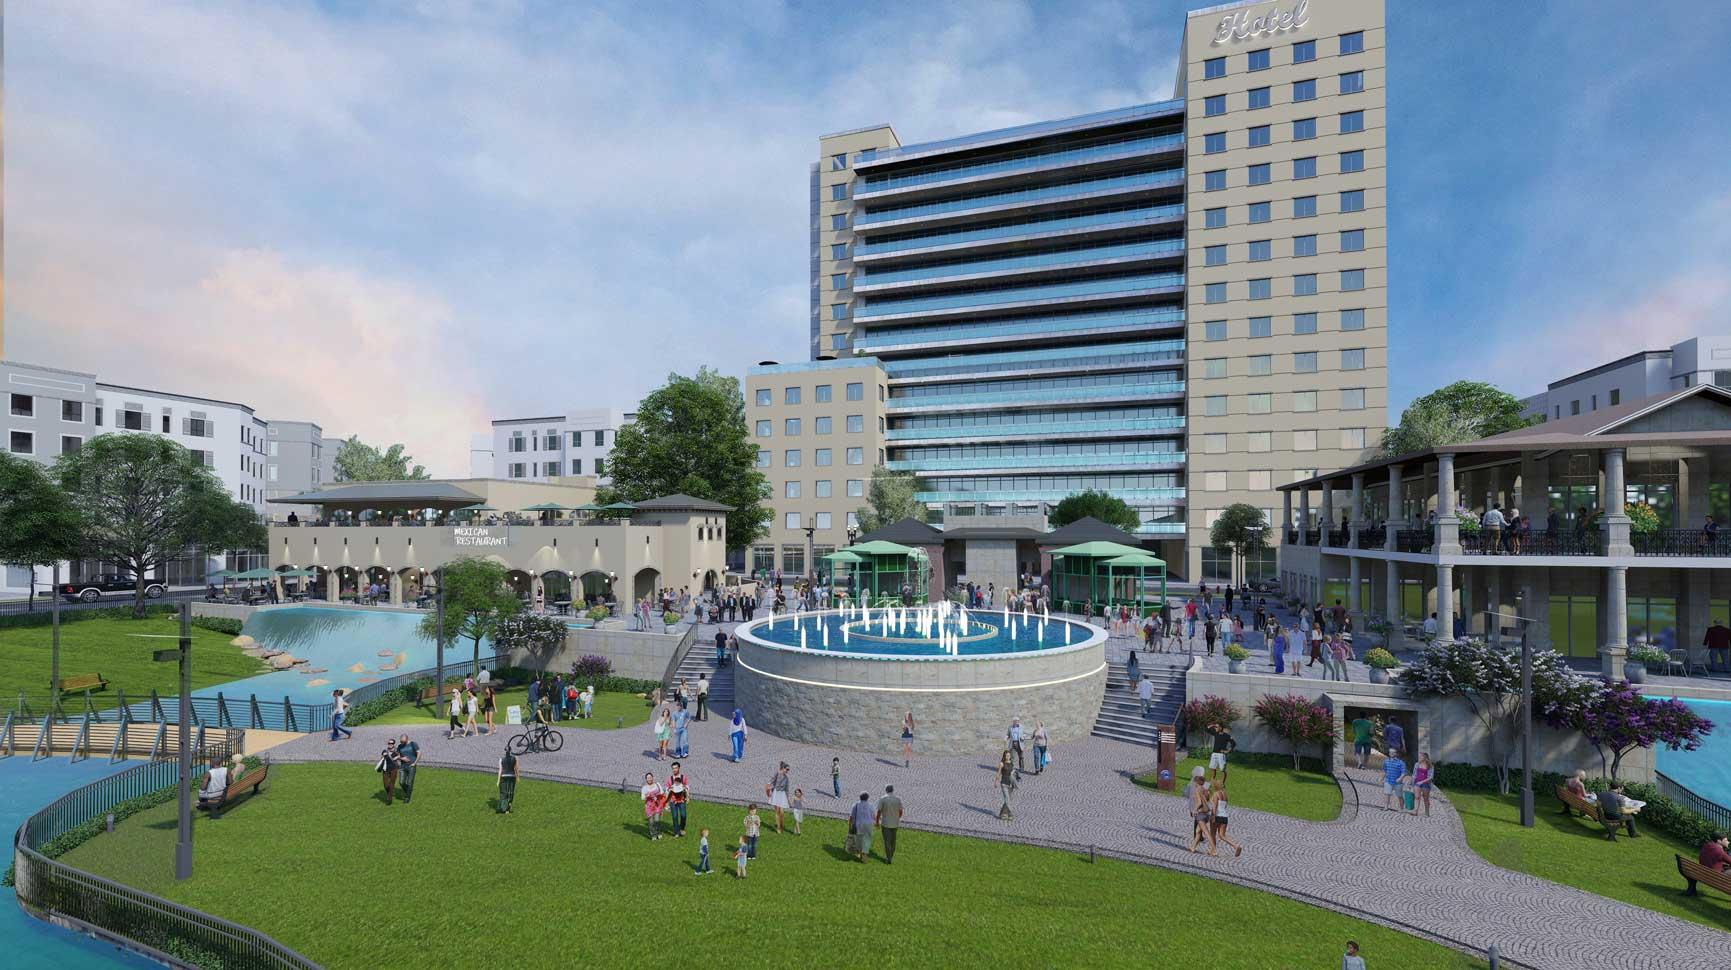 Coming soon to Plano, Texas - The Collin Creek Development